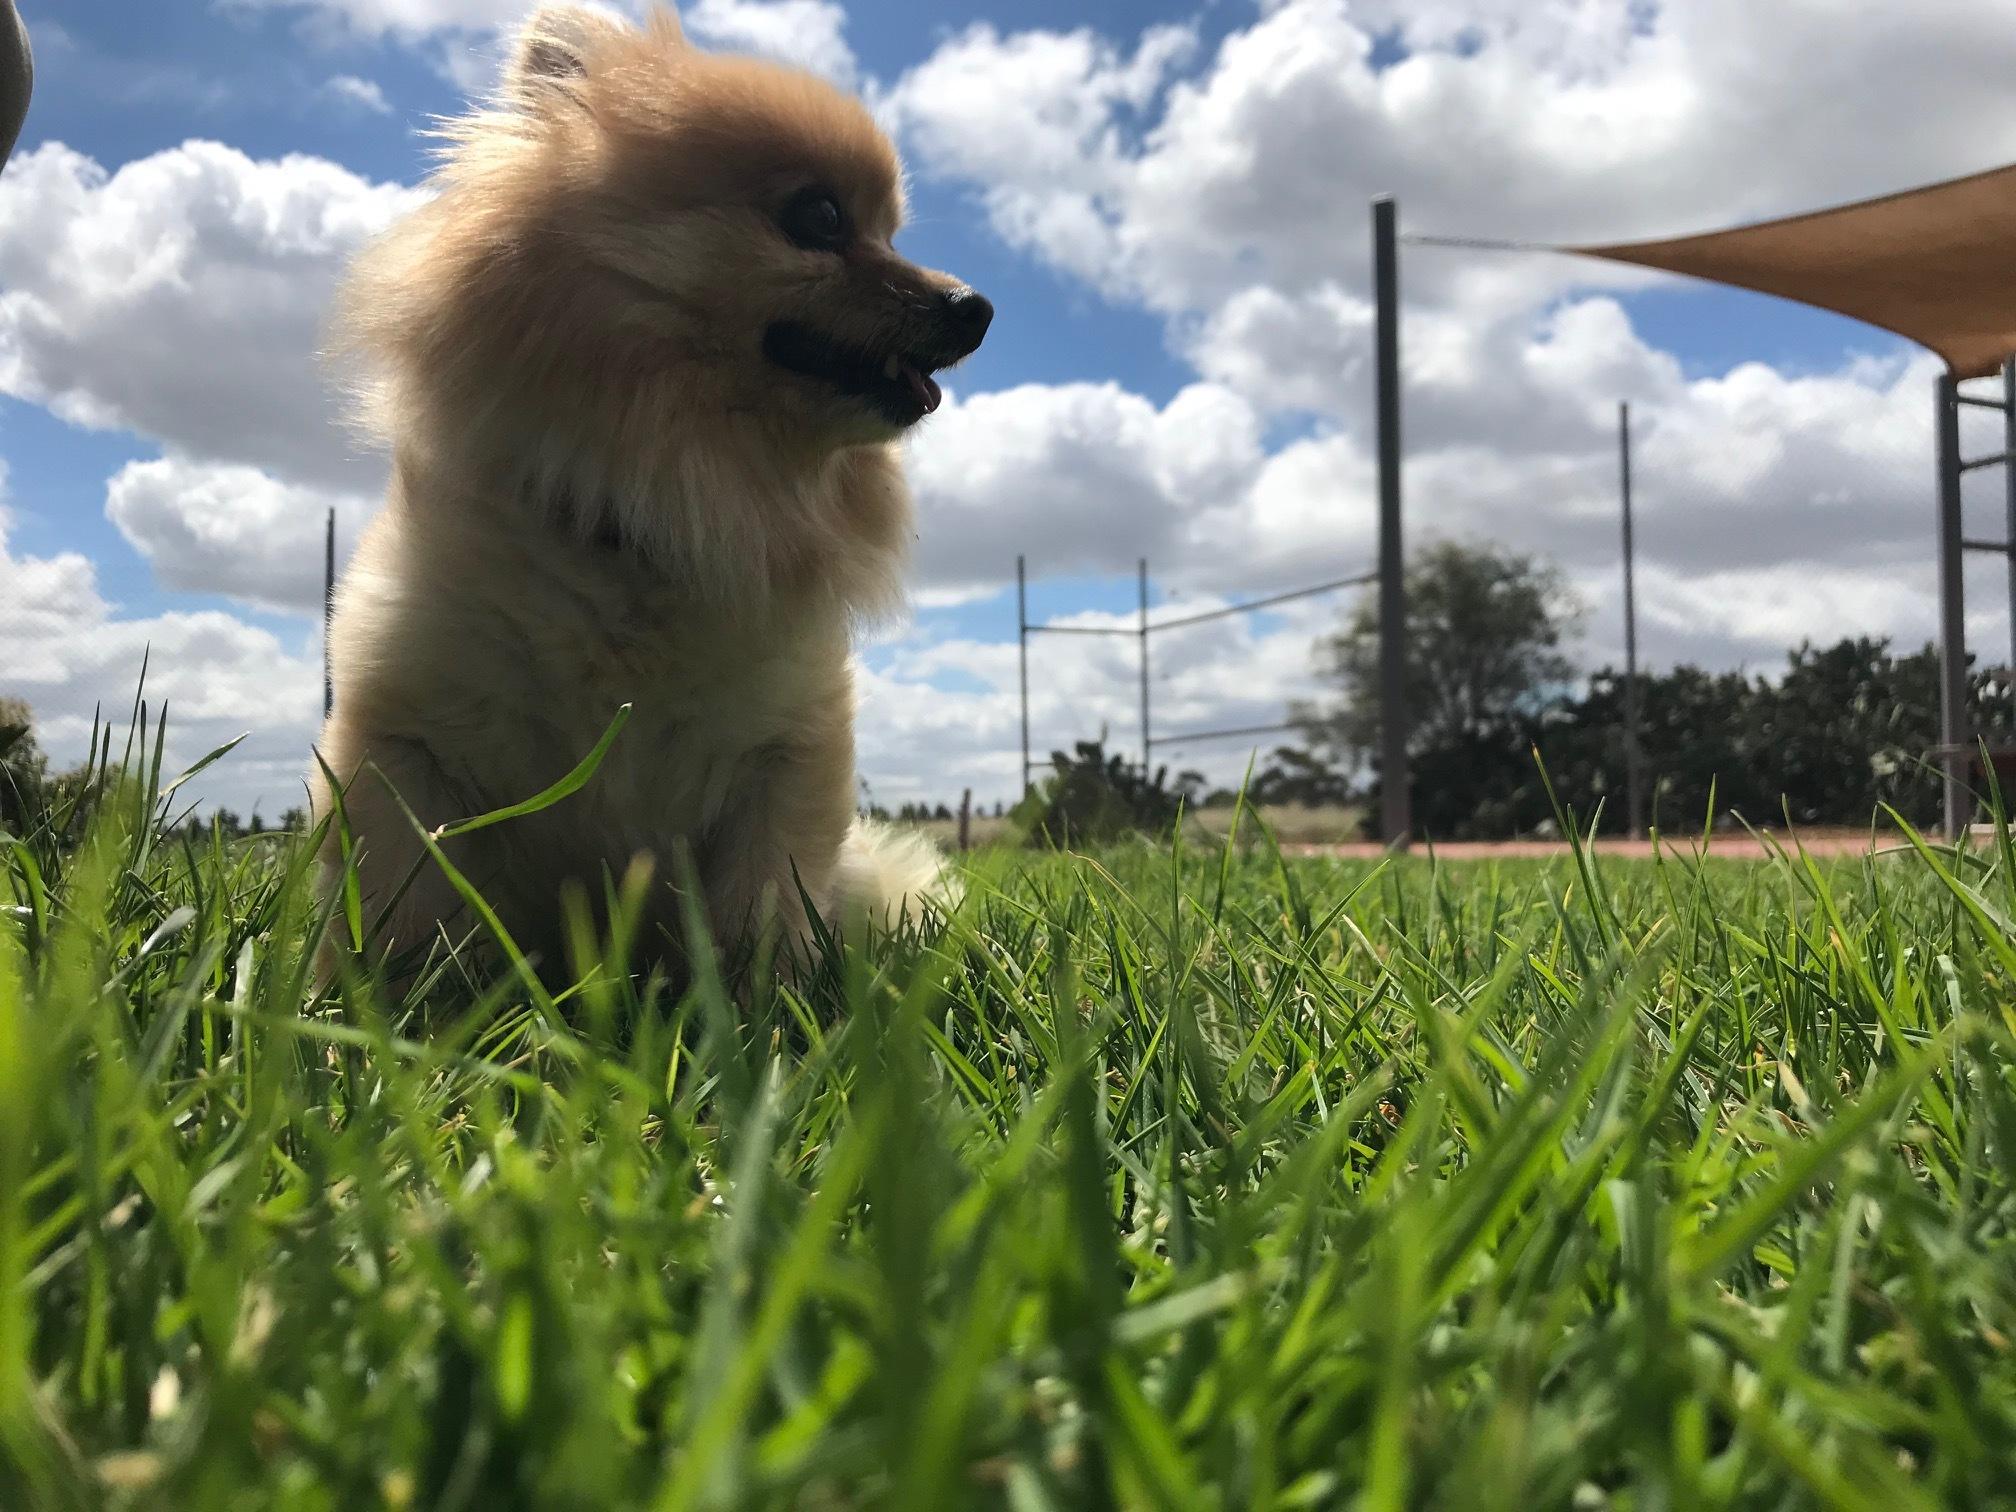 'Kitten' the little Pomeranian enjoying the serenity of 'Paw Print Park'